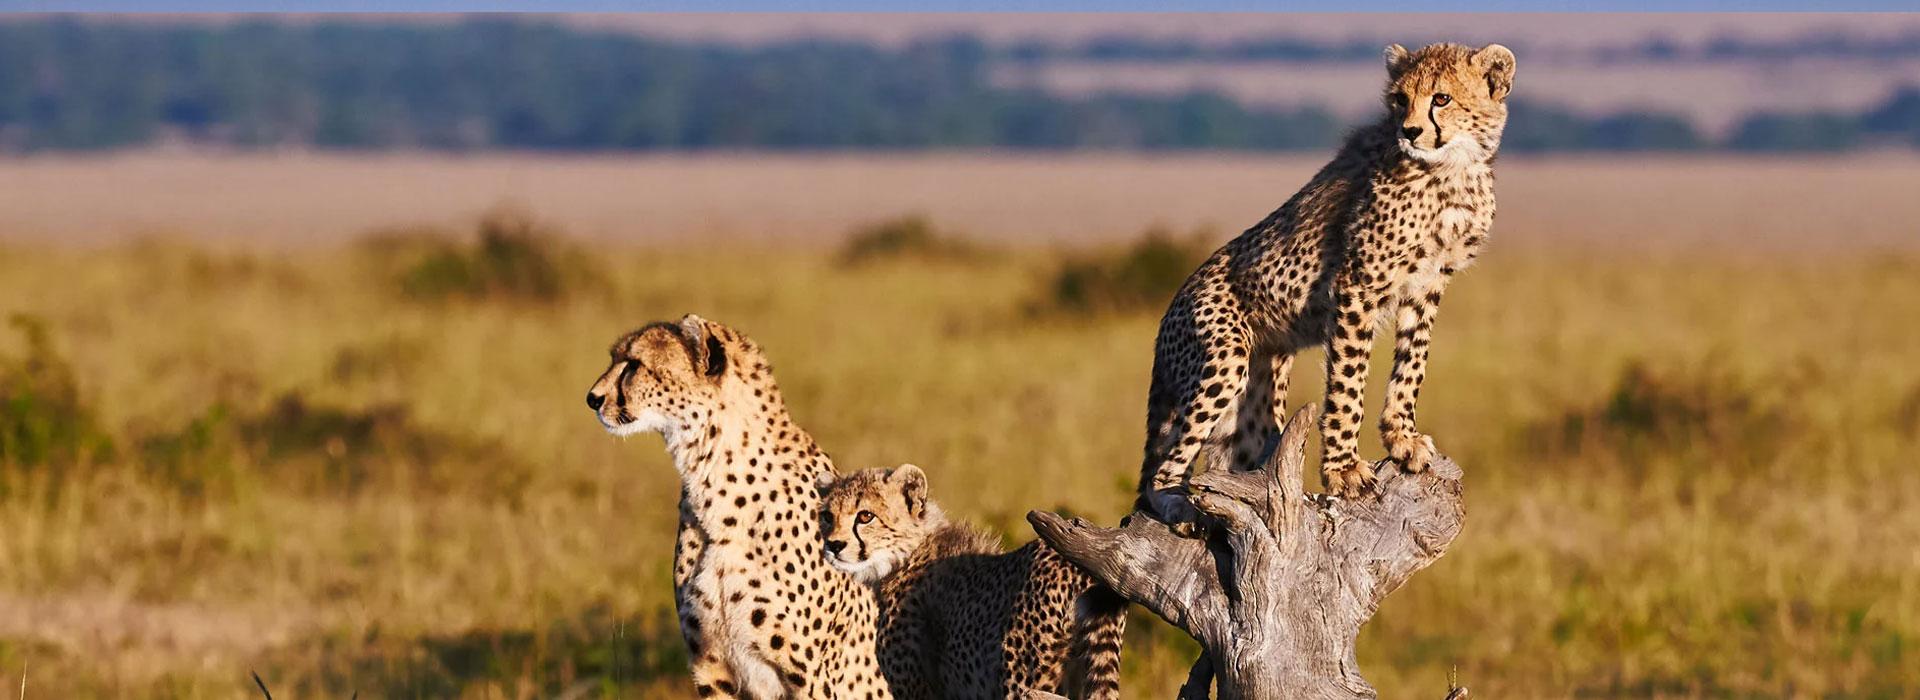 6 Days Masai Mara, Lake Nakuru and Amboseli Budget Safari